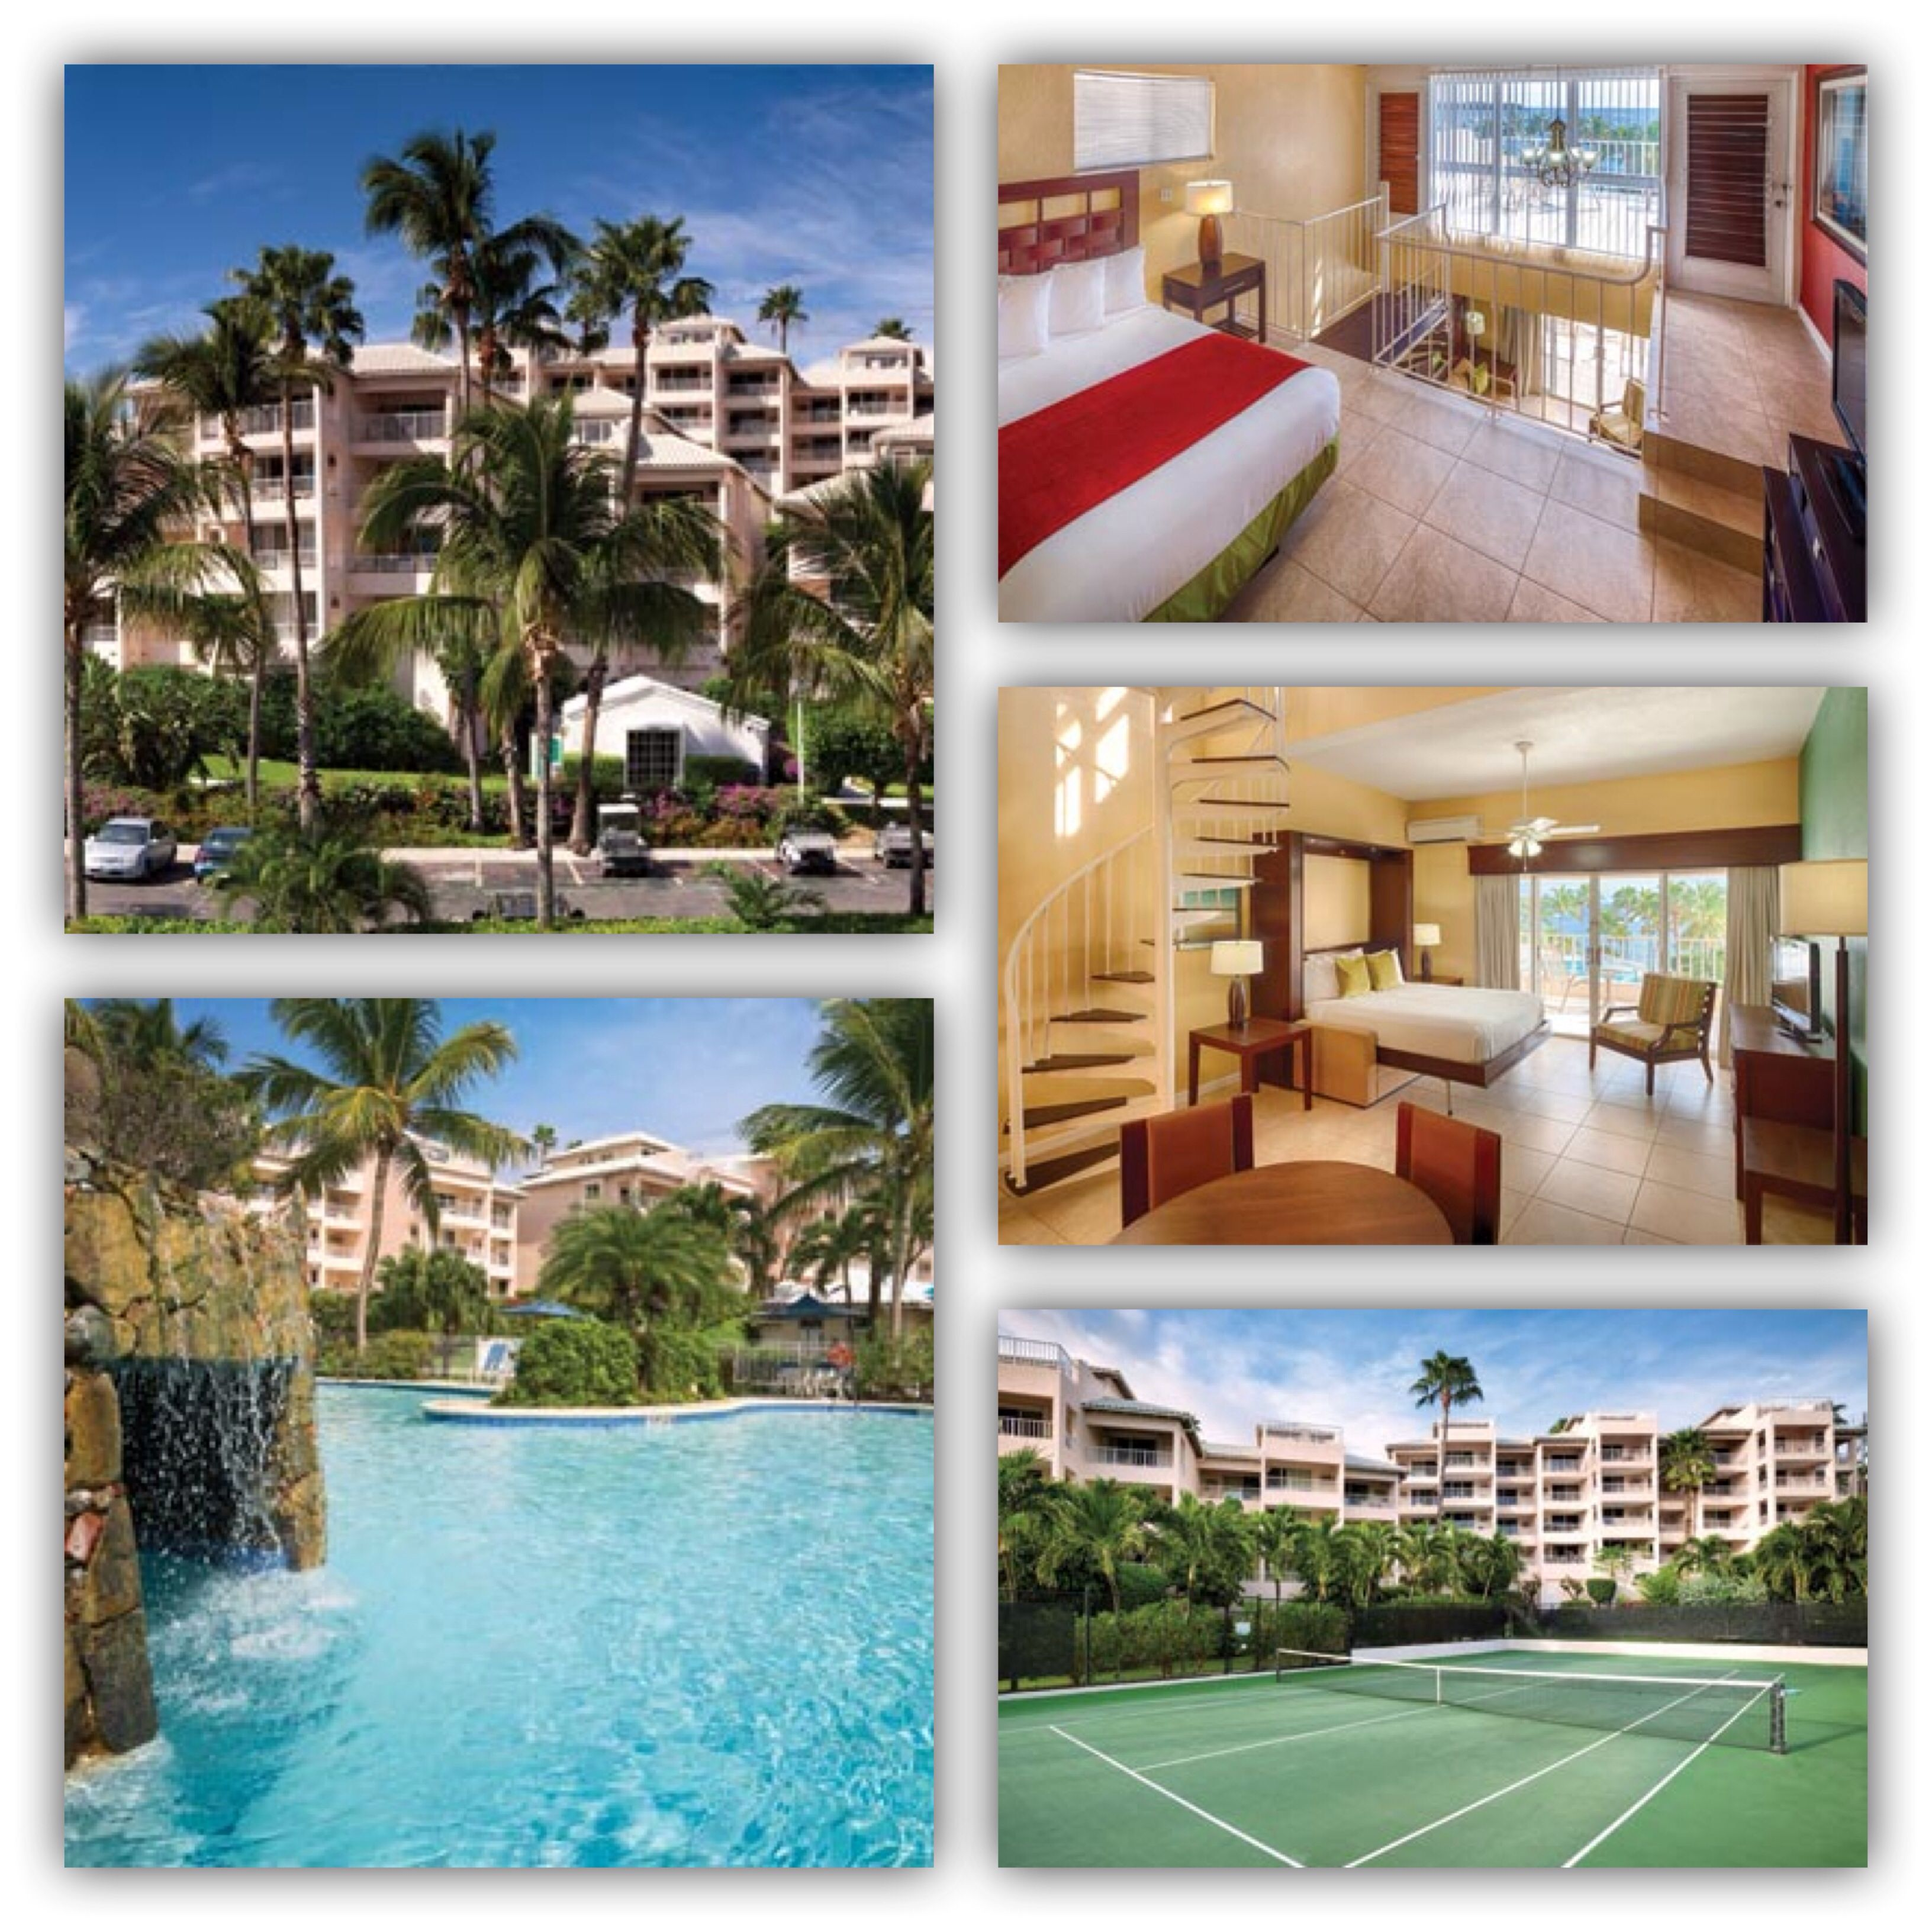 Elysian Beach Resort St Thomas Usvi Wyndham Travel Bucket List Pinterest Resorts And